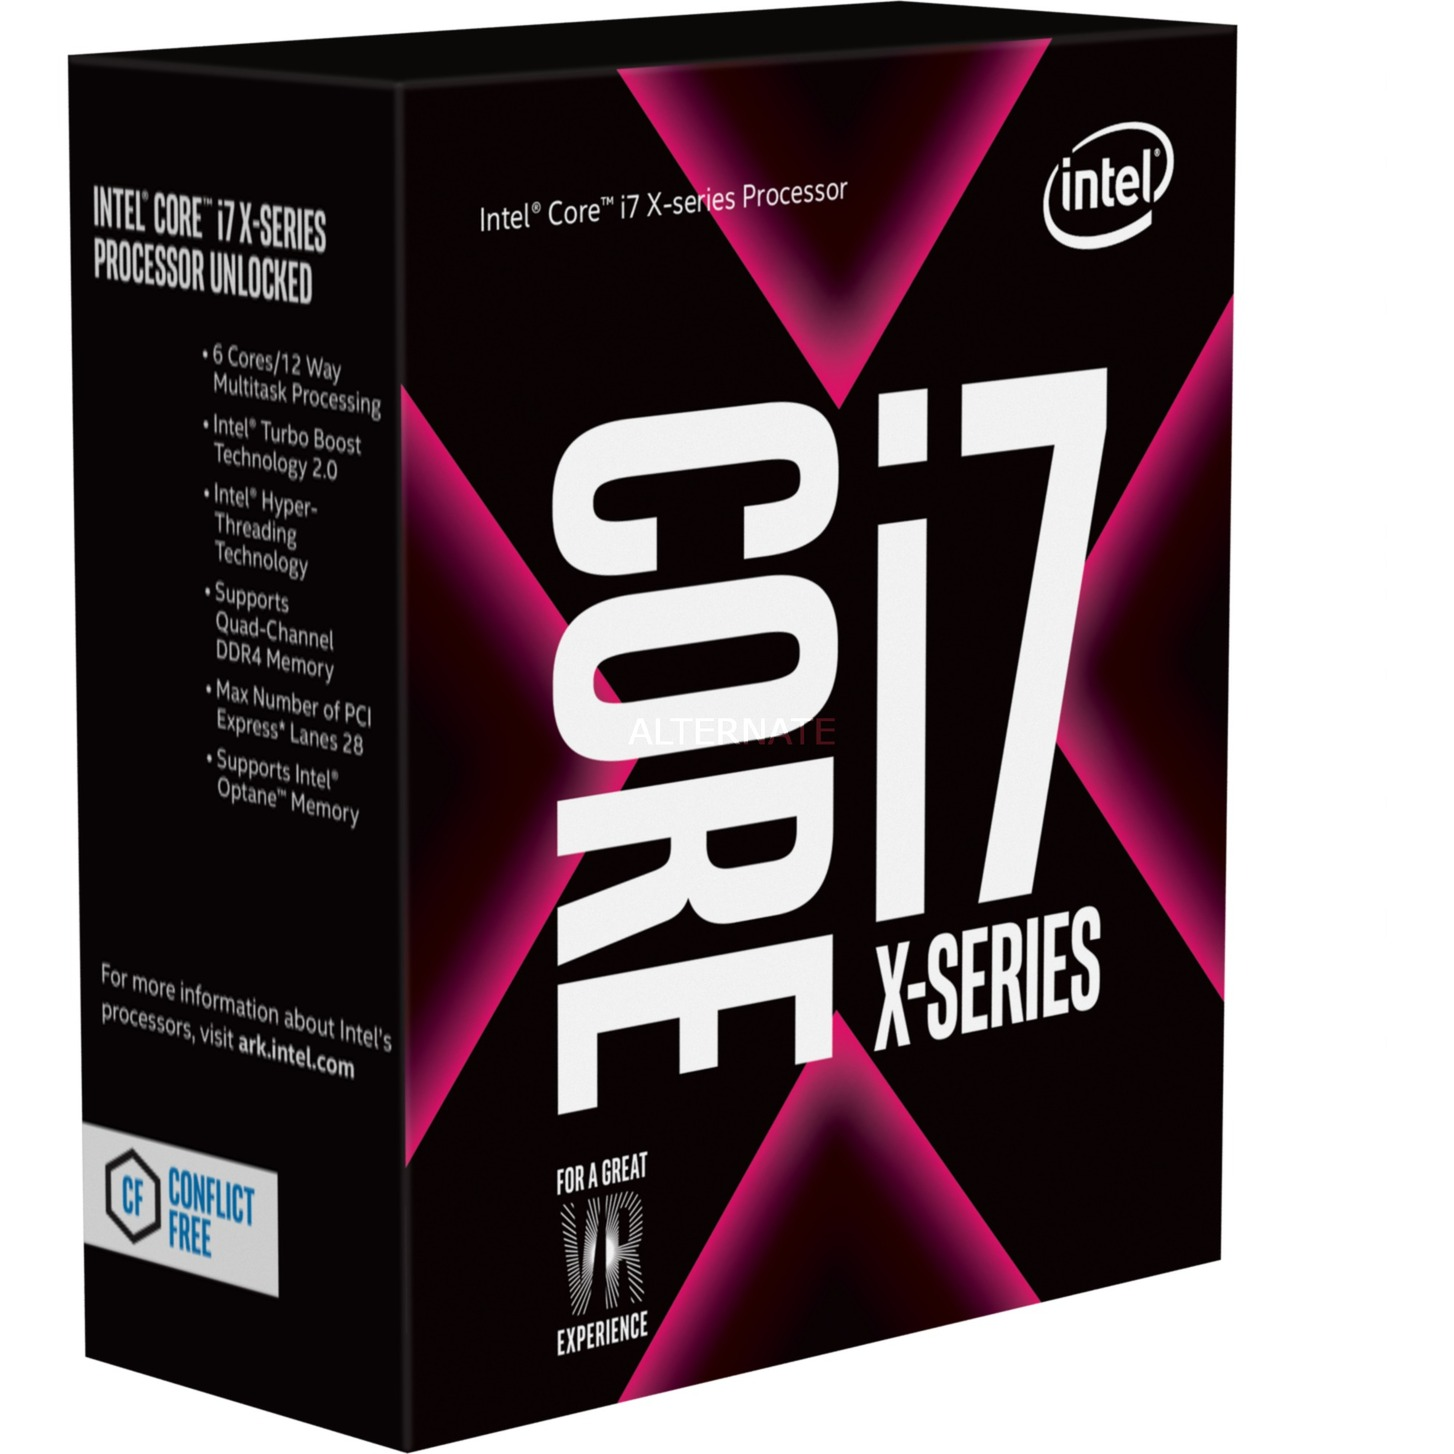 Core i7-7800X X-series Processor (8.25M Cache, up to 4.00 GHz) 3.5GHz 8.25MB L3 Caja procesador